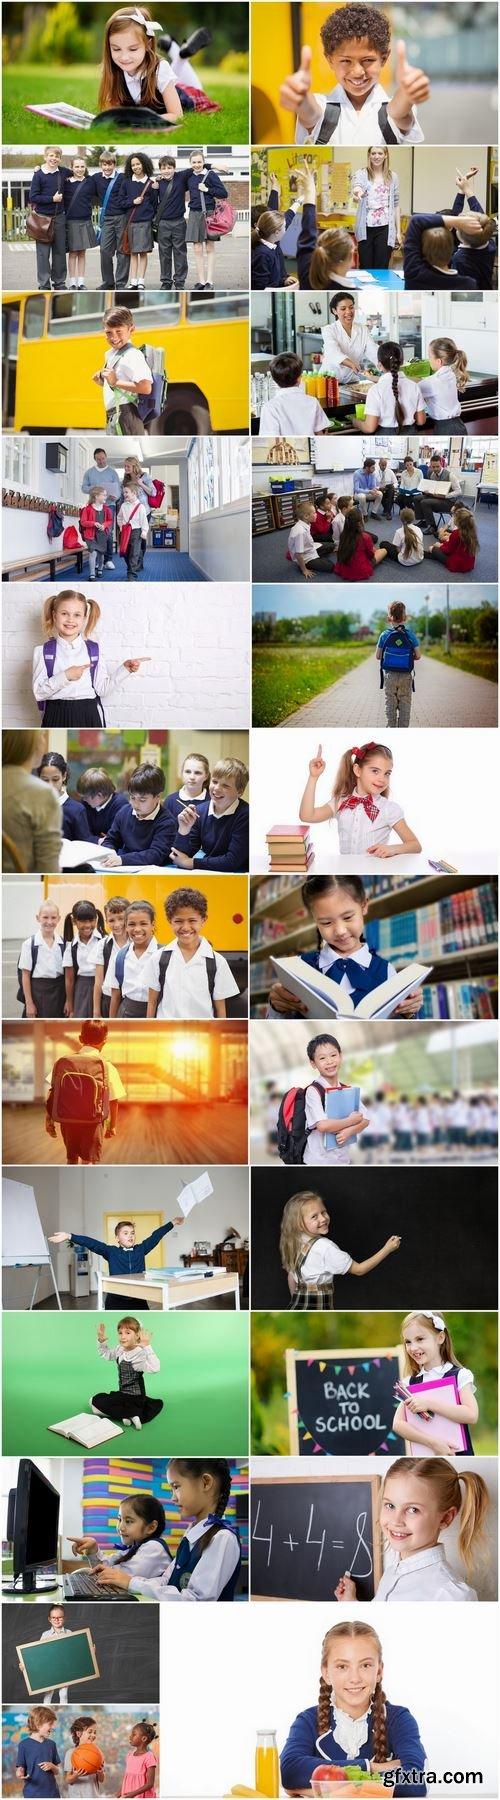 Child children in school uniforms study library class lesson 25 HQ Jpeg